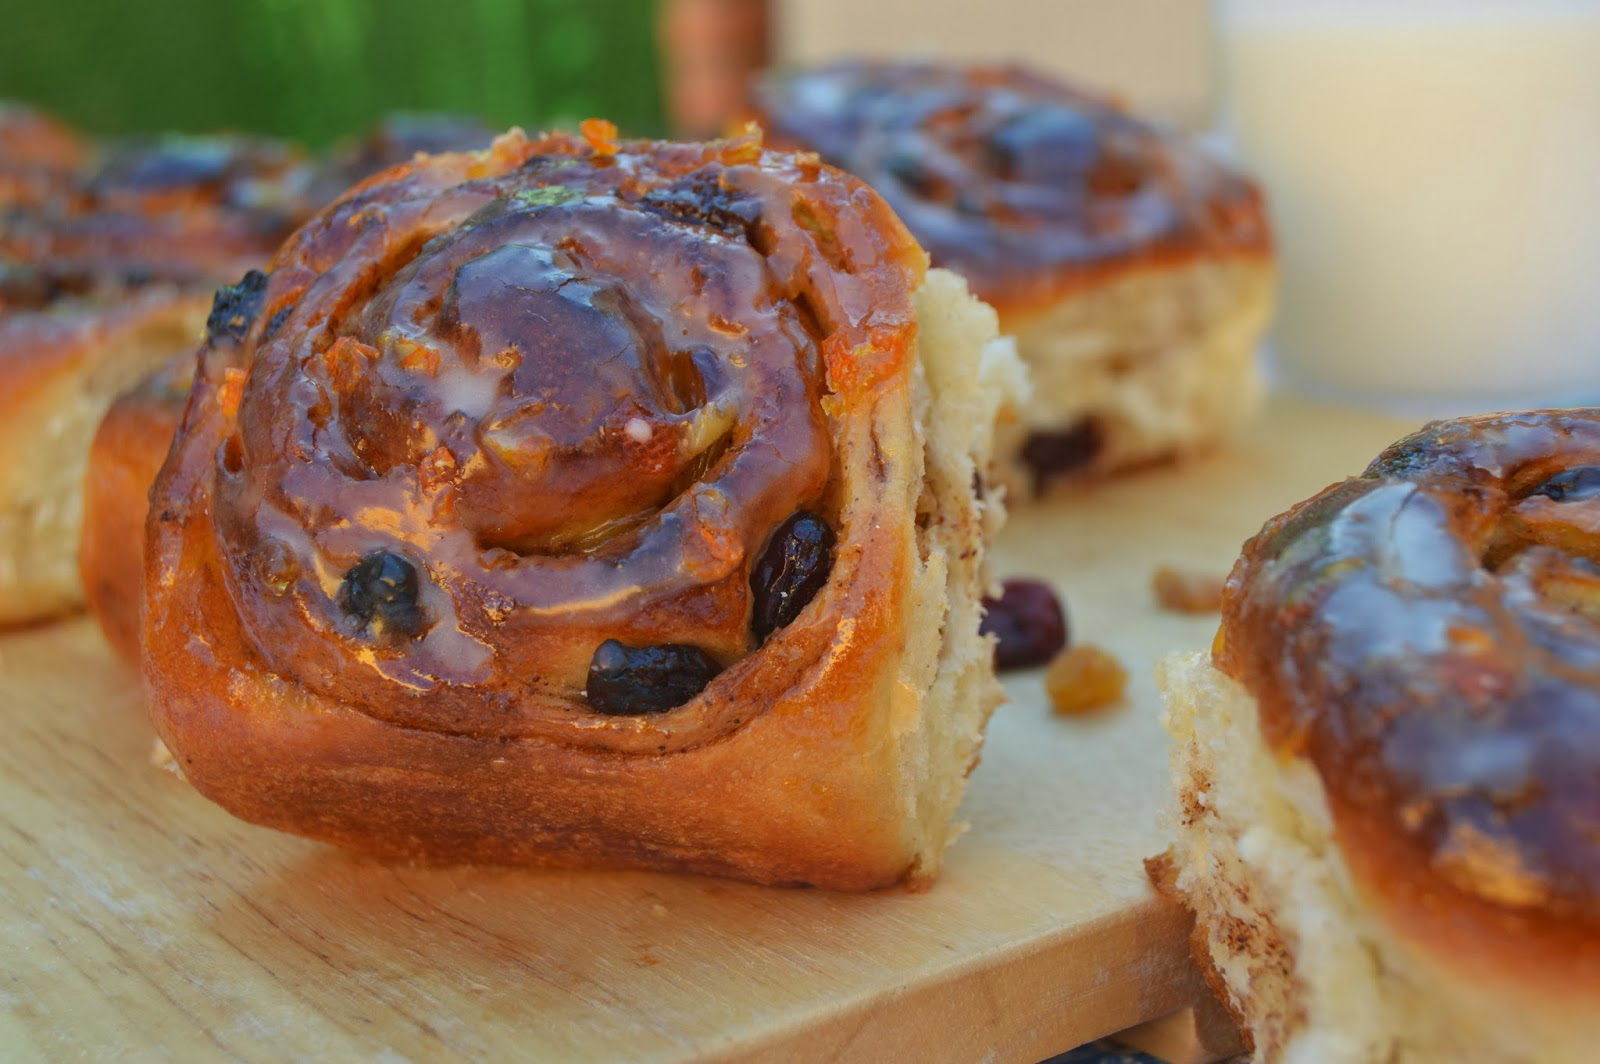 buns ham and cheese buns chelsea buns shopzed chelsea buns recipes